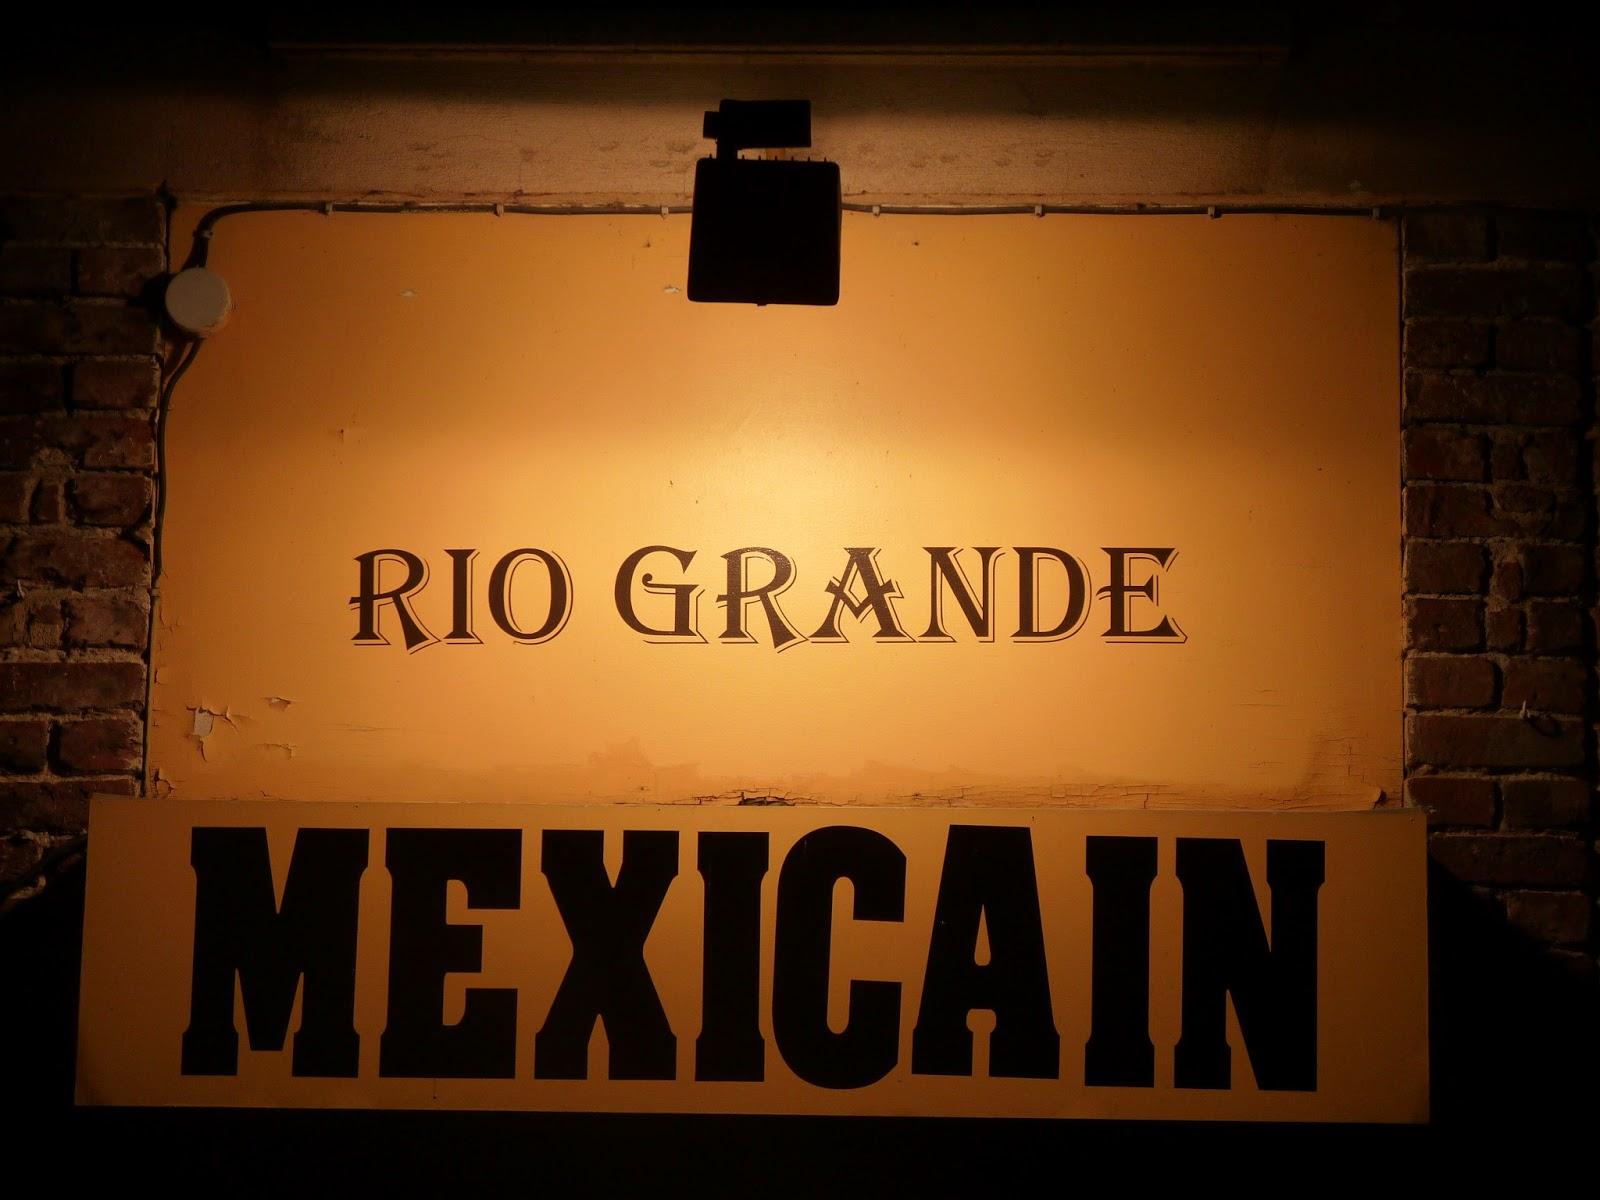 Par faim d'arômes: Restaurant mexicain à Rouen, El Rio Grande